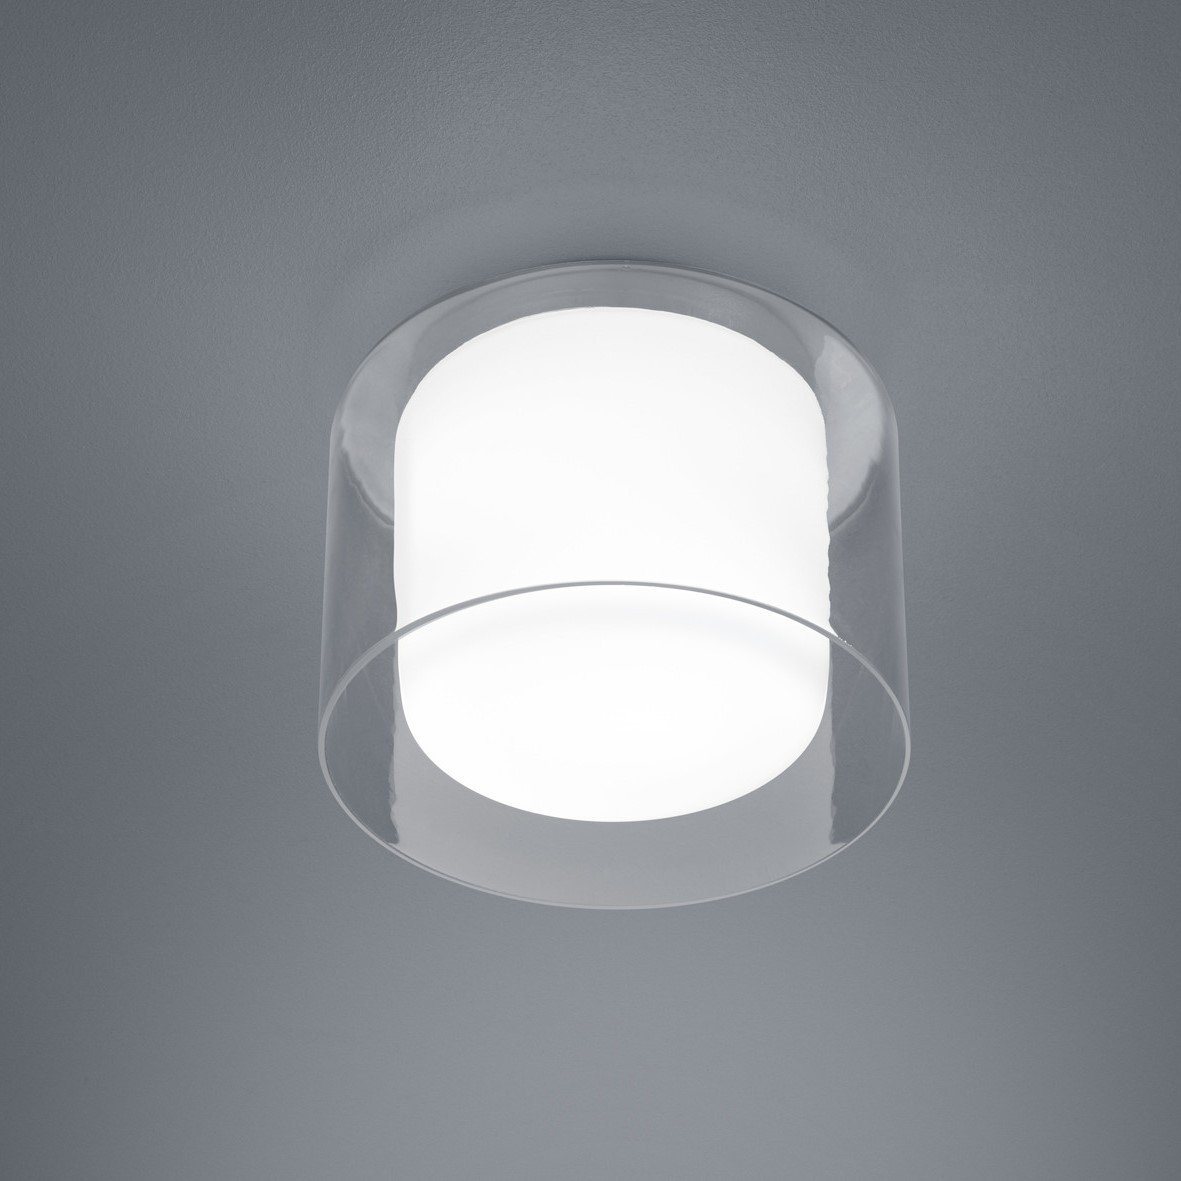 Plafondlamp Olvi IP44 Klein